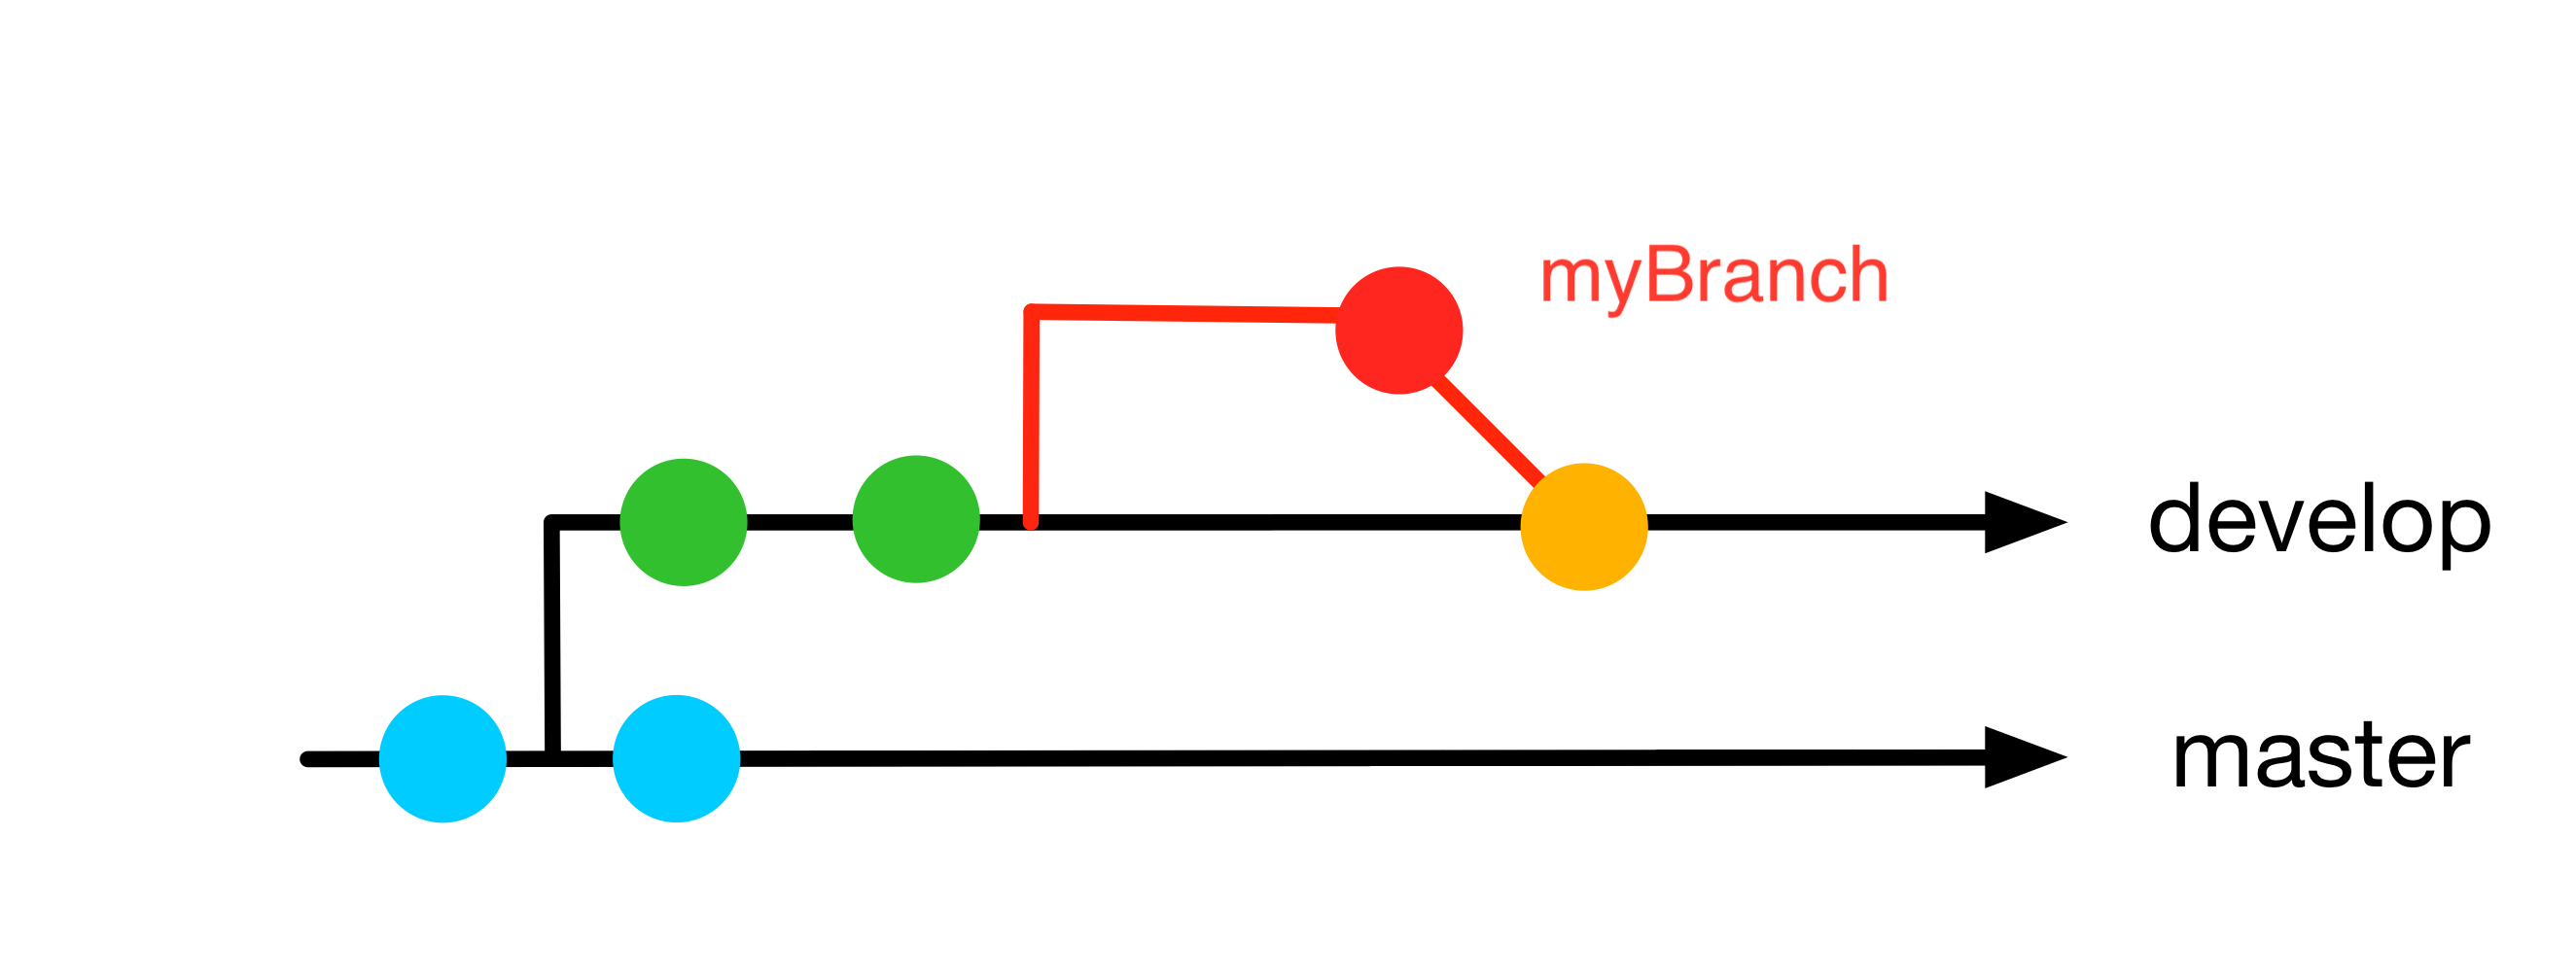 2021/2021-03-18_basicGitTraining/slides/img/branch-merge.png